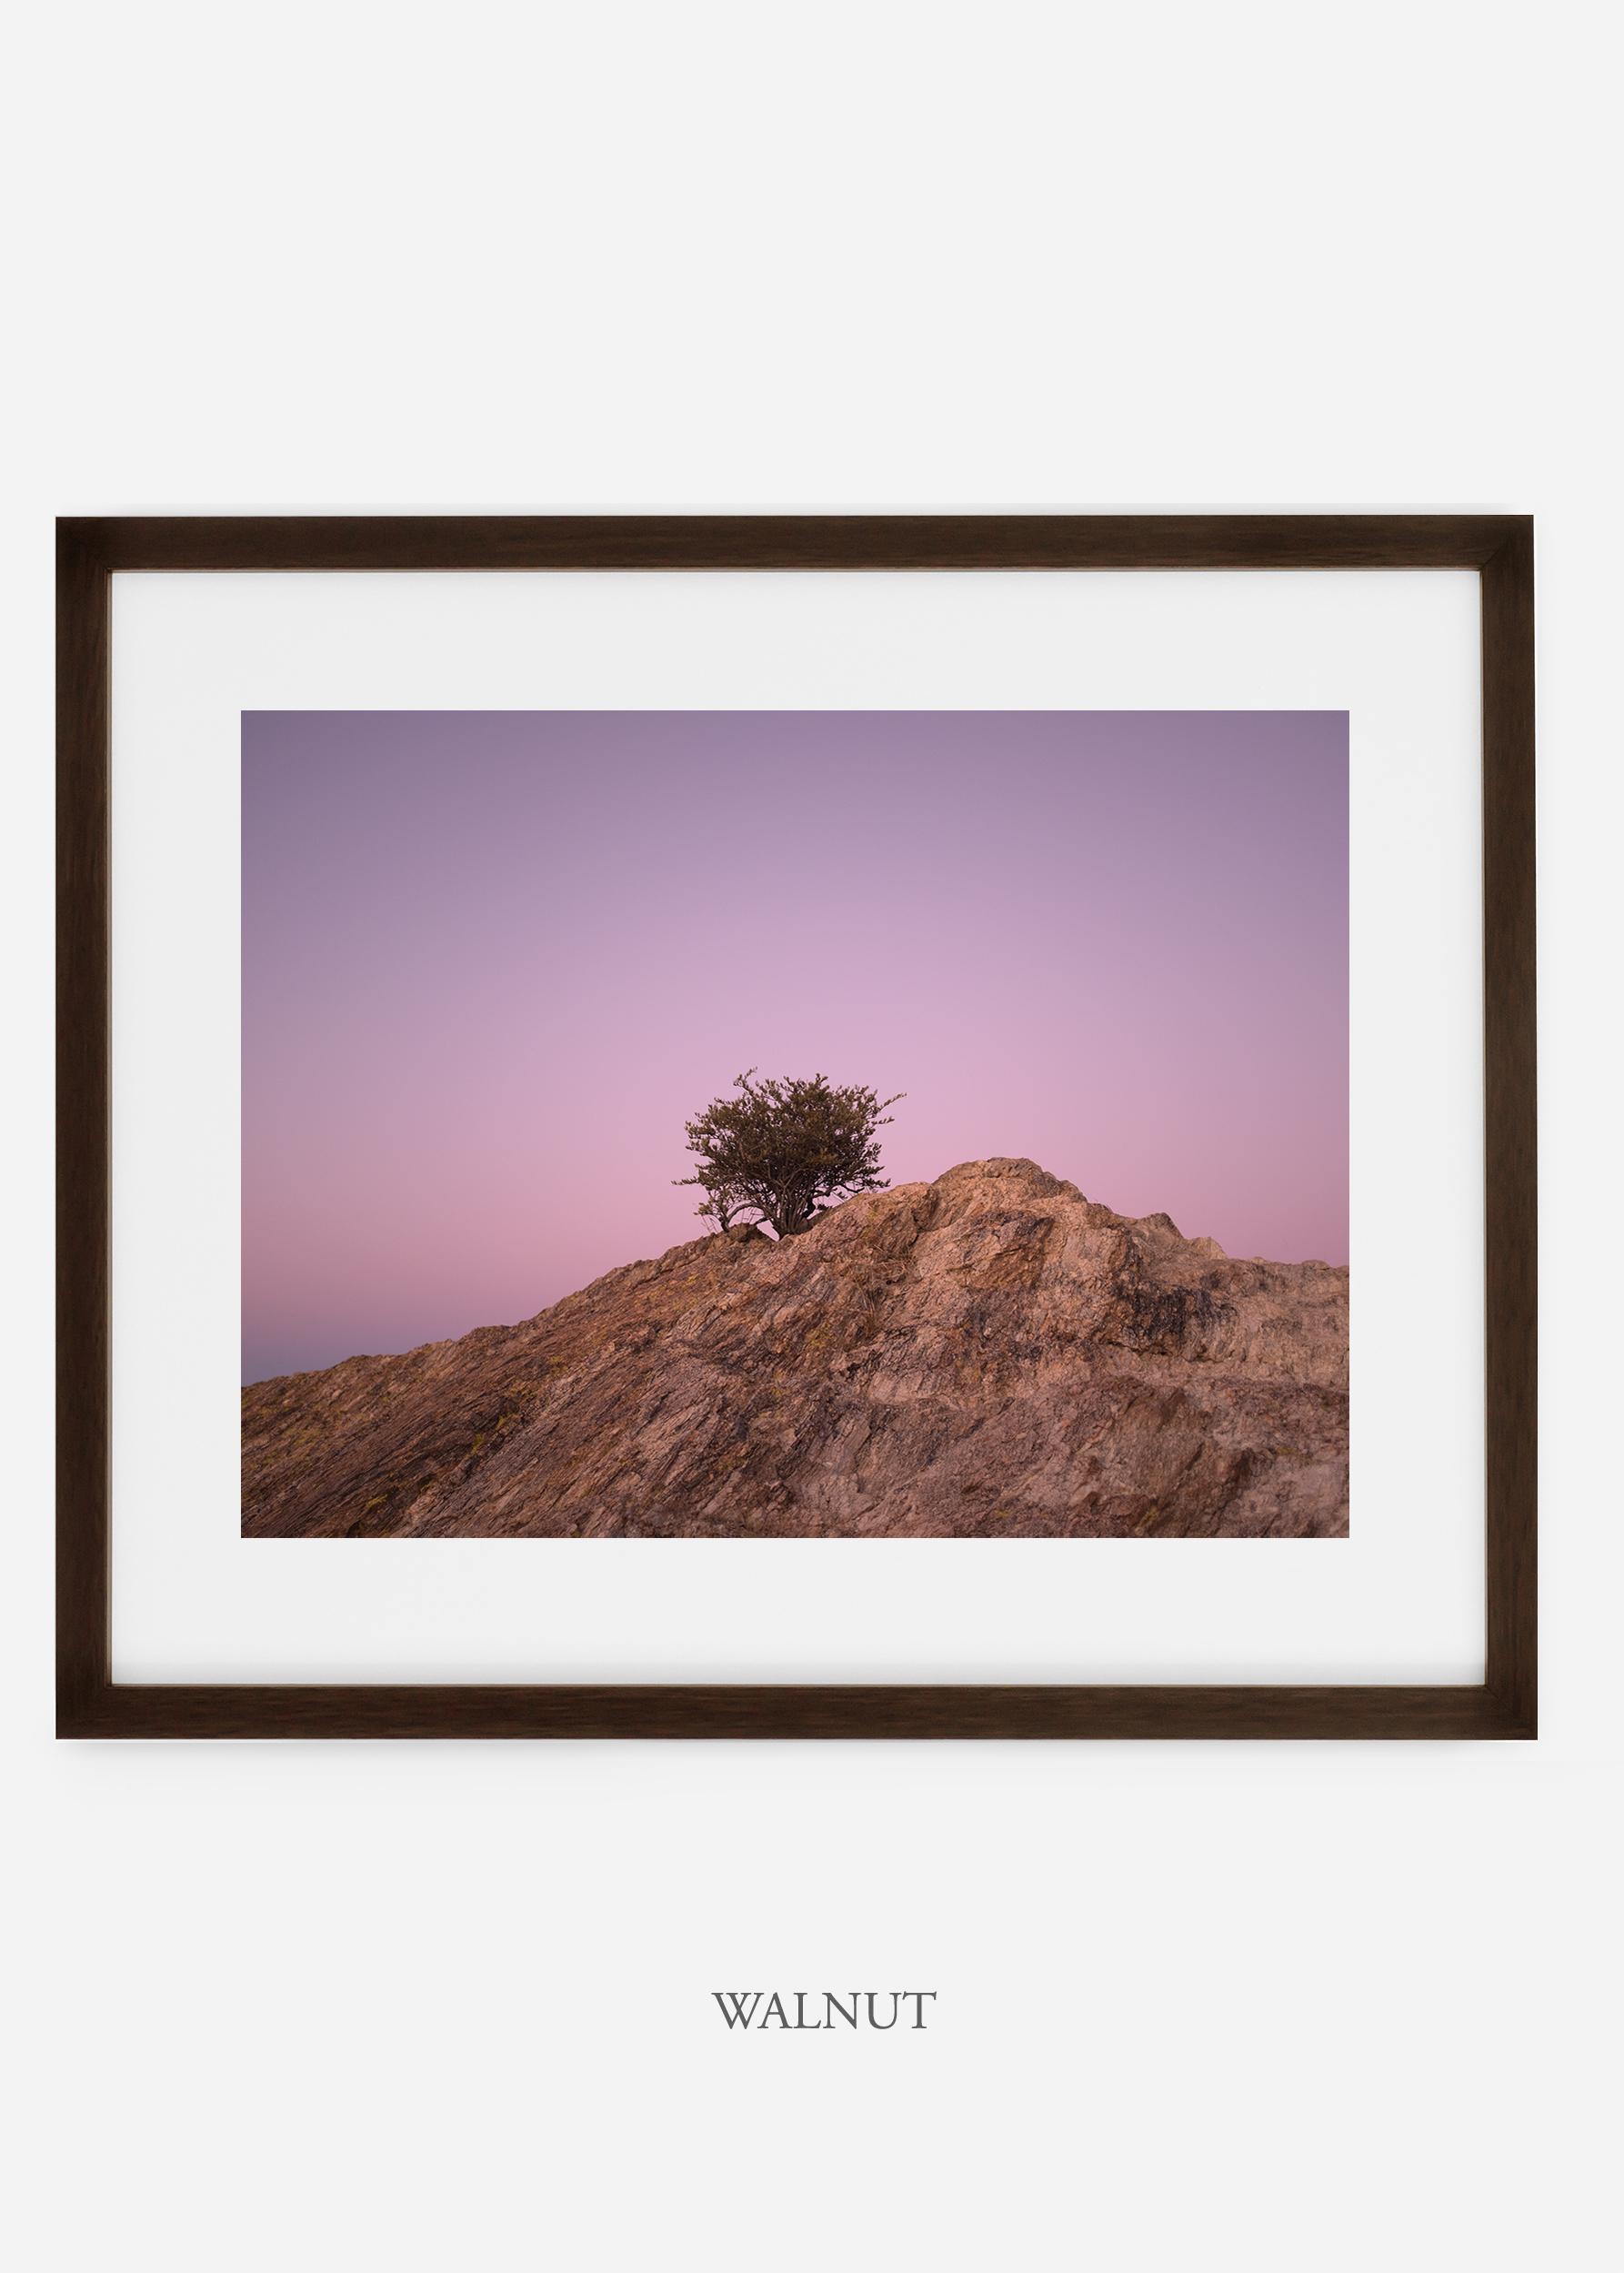 walnutframe-saguaroNo.11-wildercalifornia-art-wallart-cactusprint-homedecor-prints-arizona-botanical-artwork-interiordesign.jpg